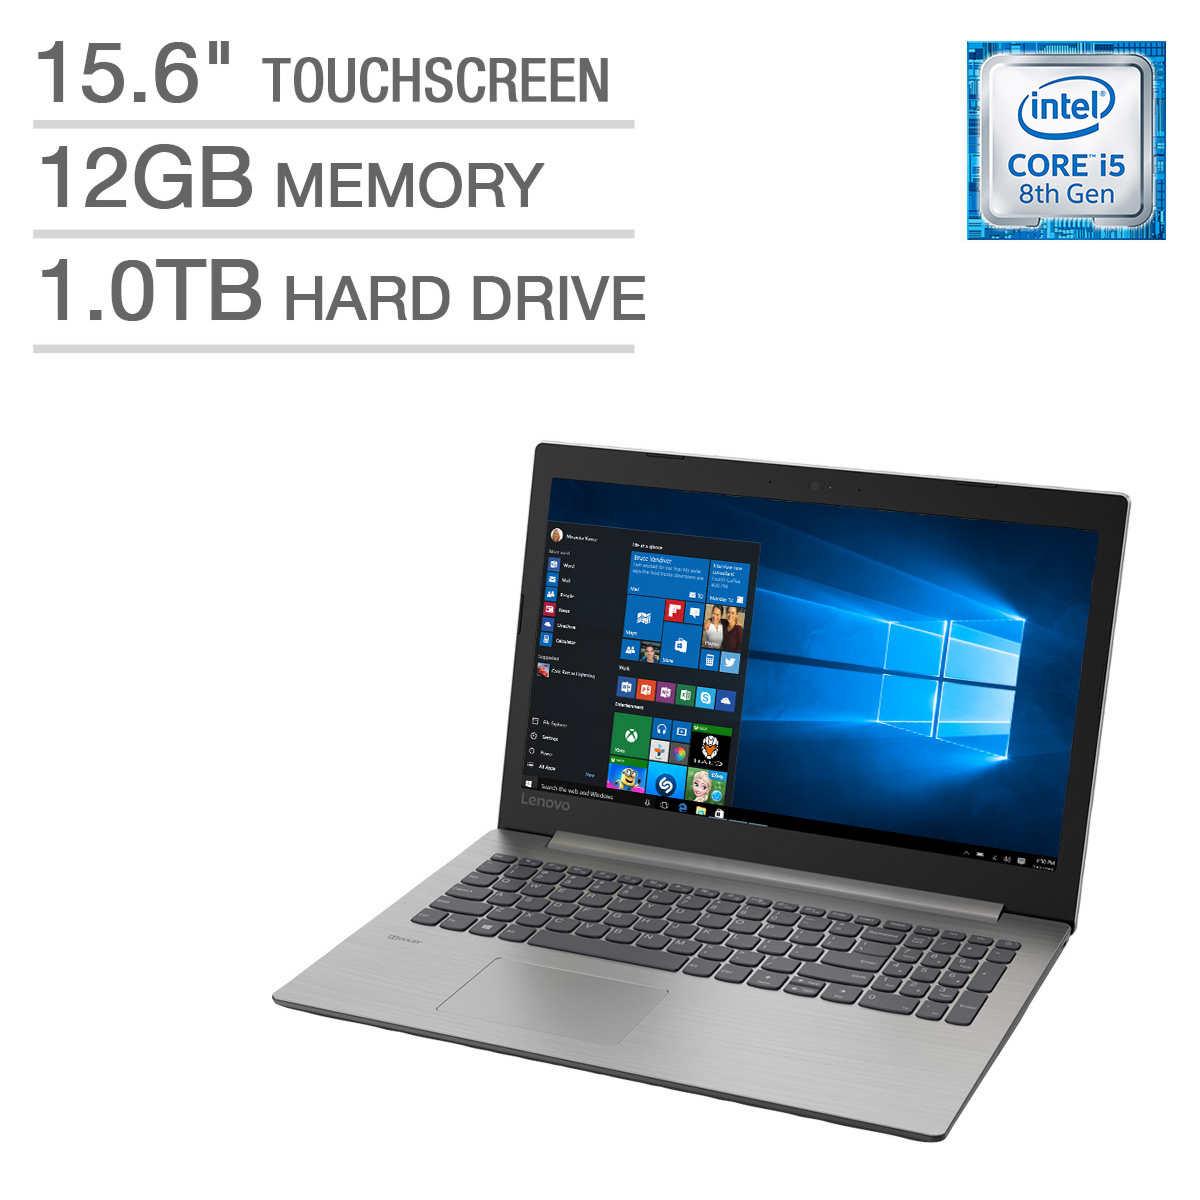 Lenovo Ideapad 330 15 Touchscreen Laptop - Intel Core i5